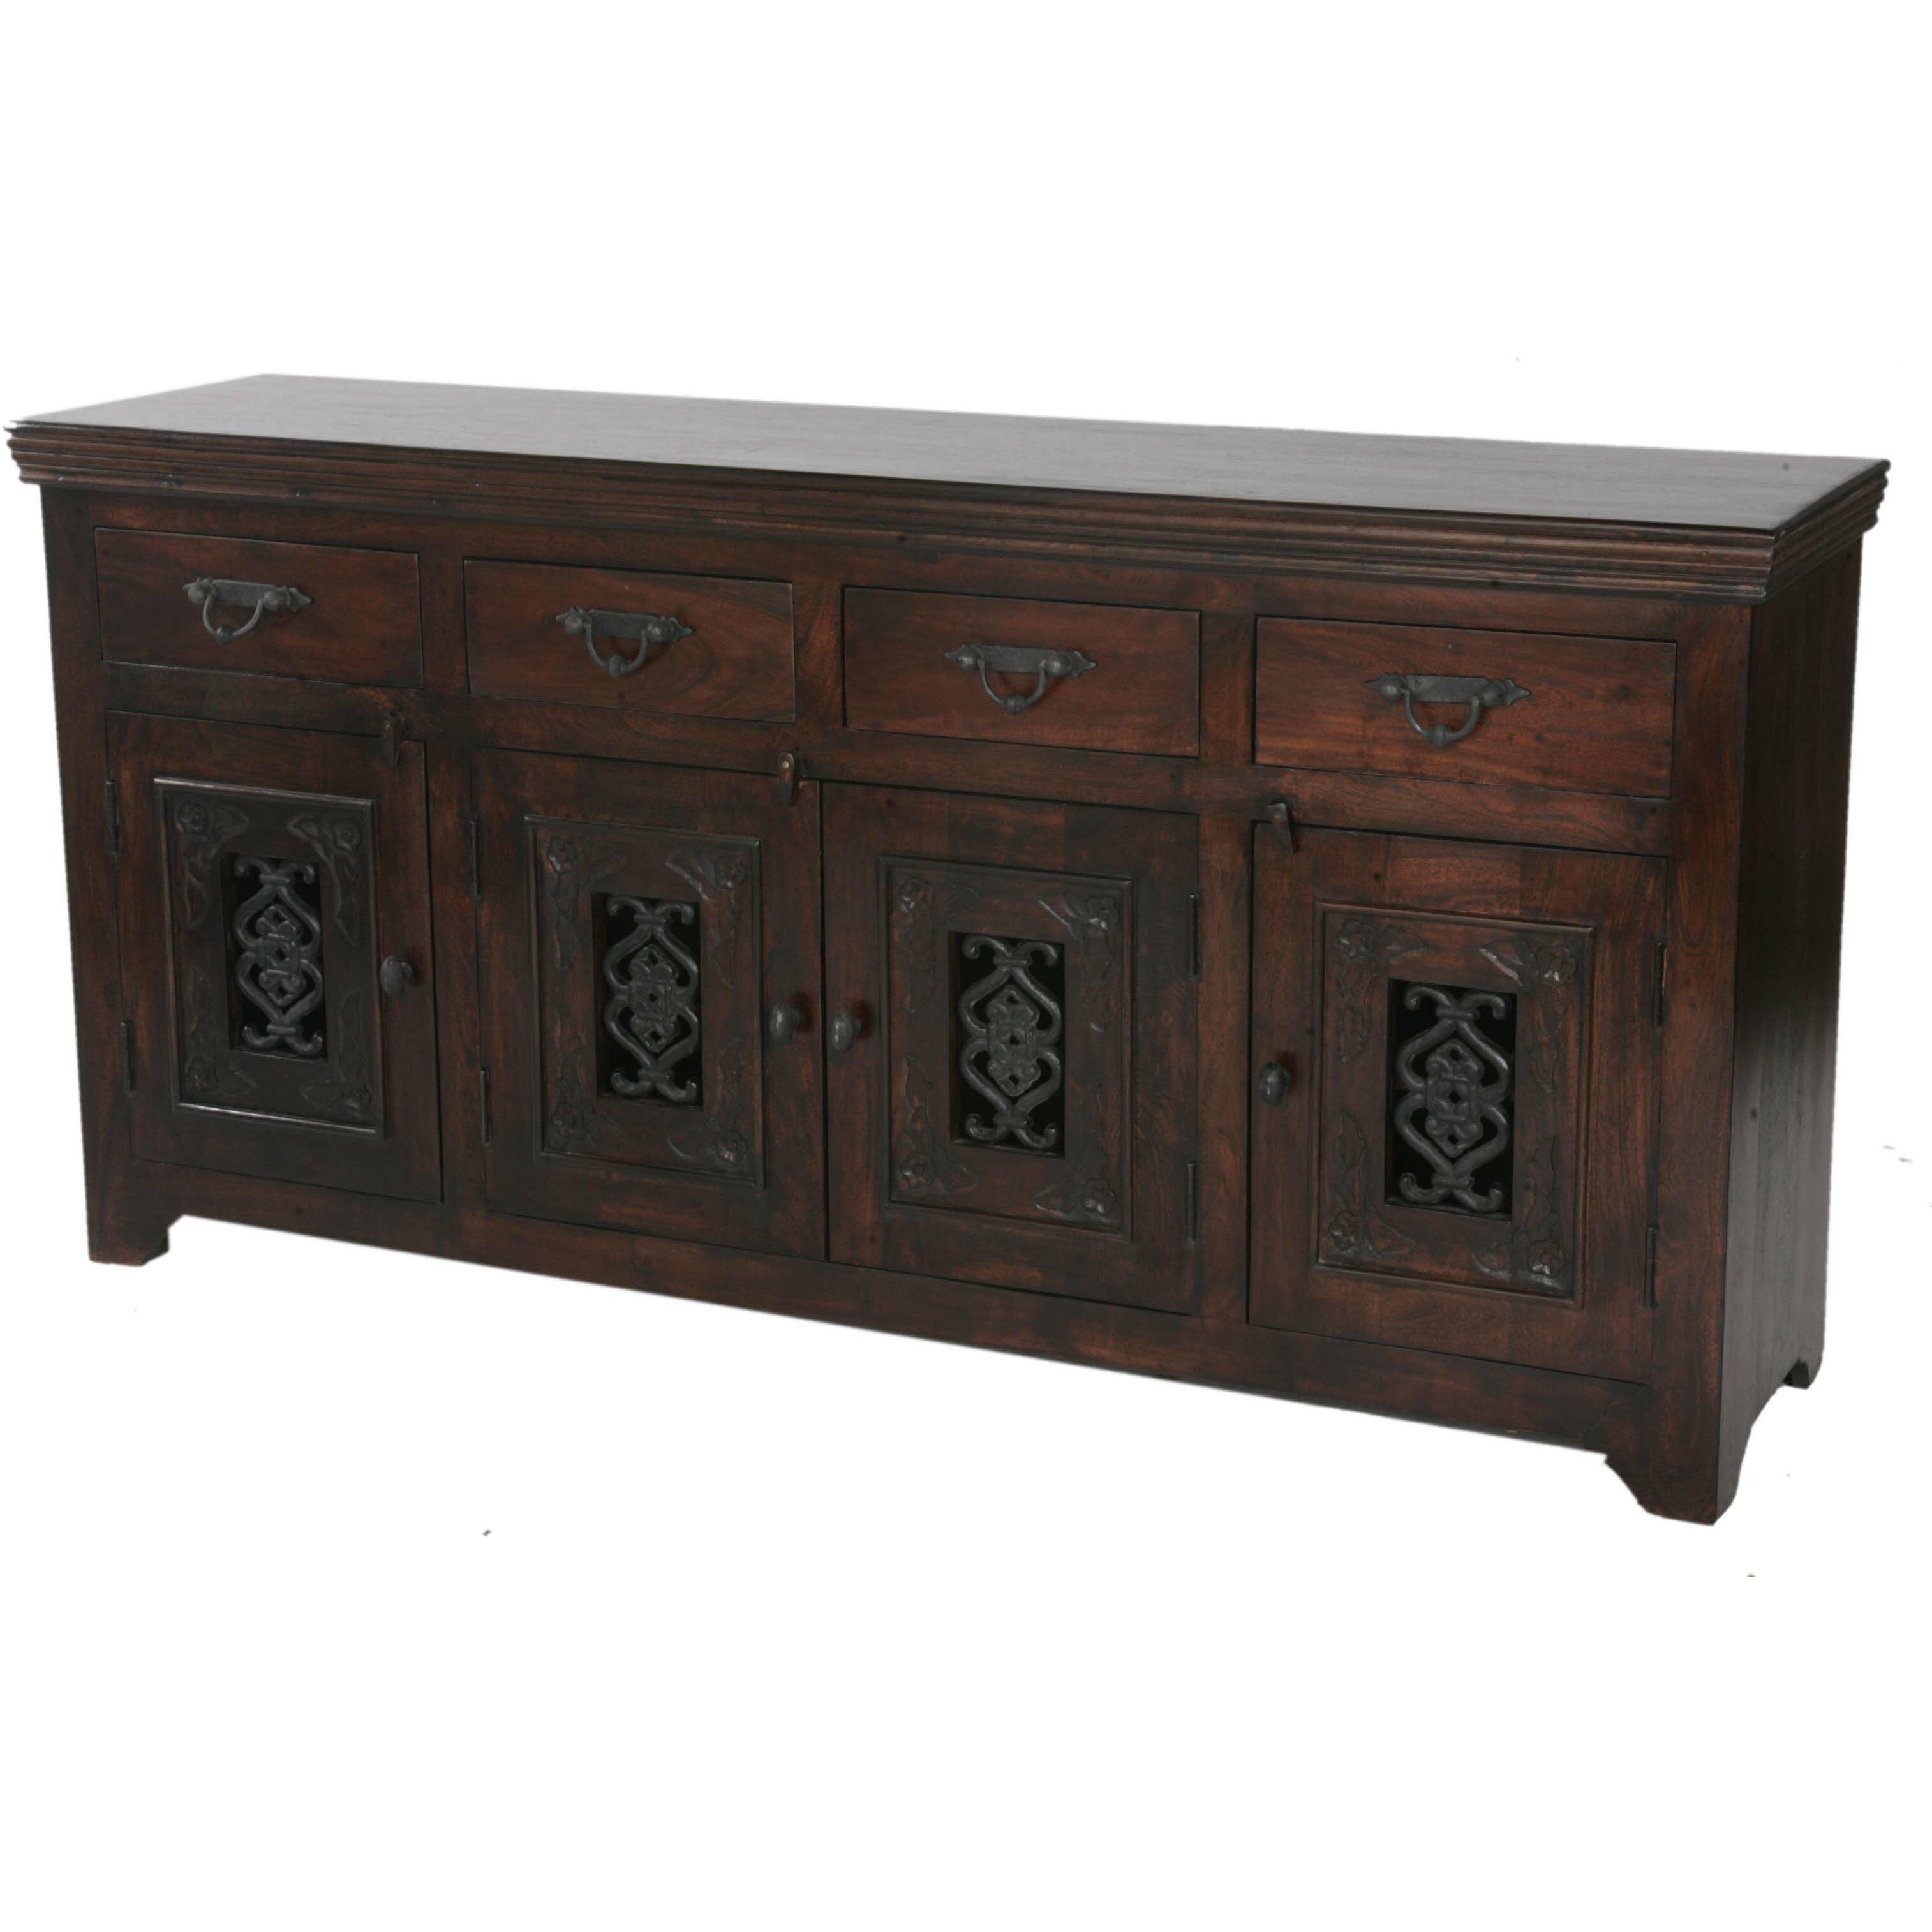 Furniture Kitchen & Dining Furniture Sideboards & Buffets MOTI ...